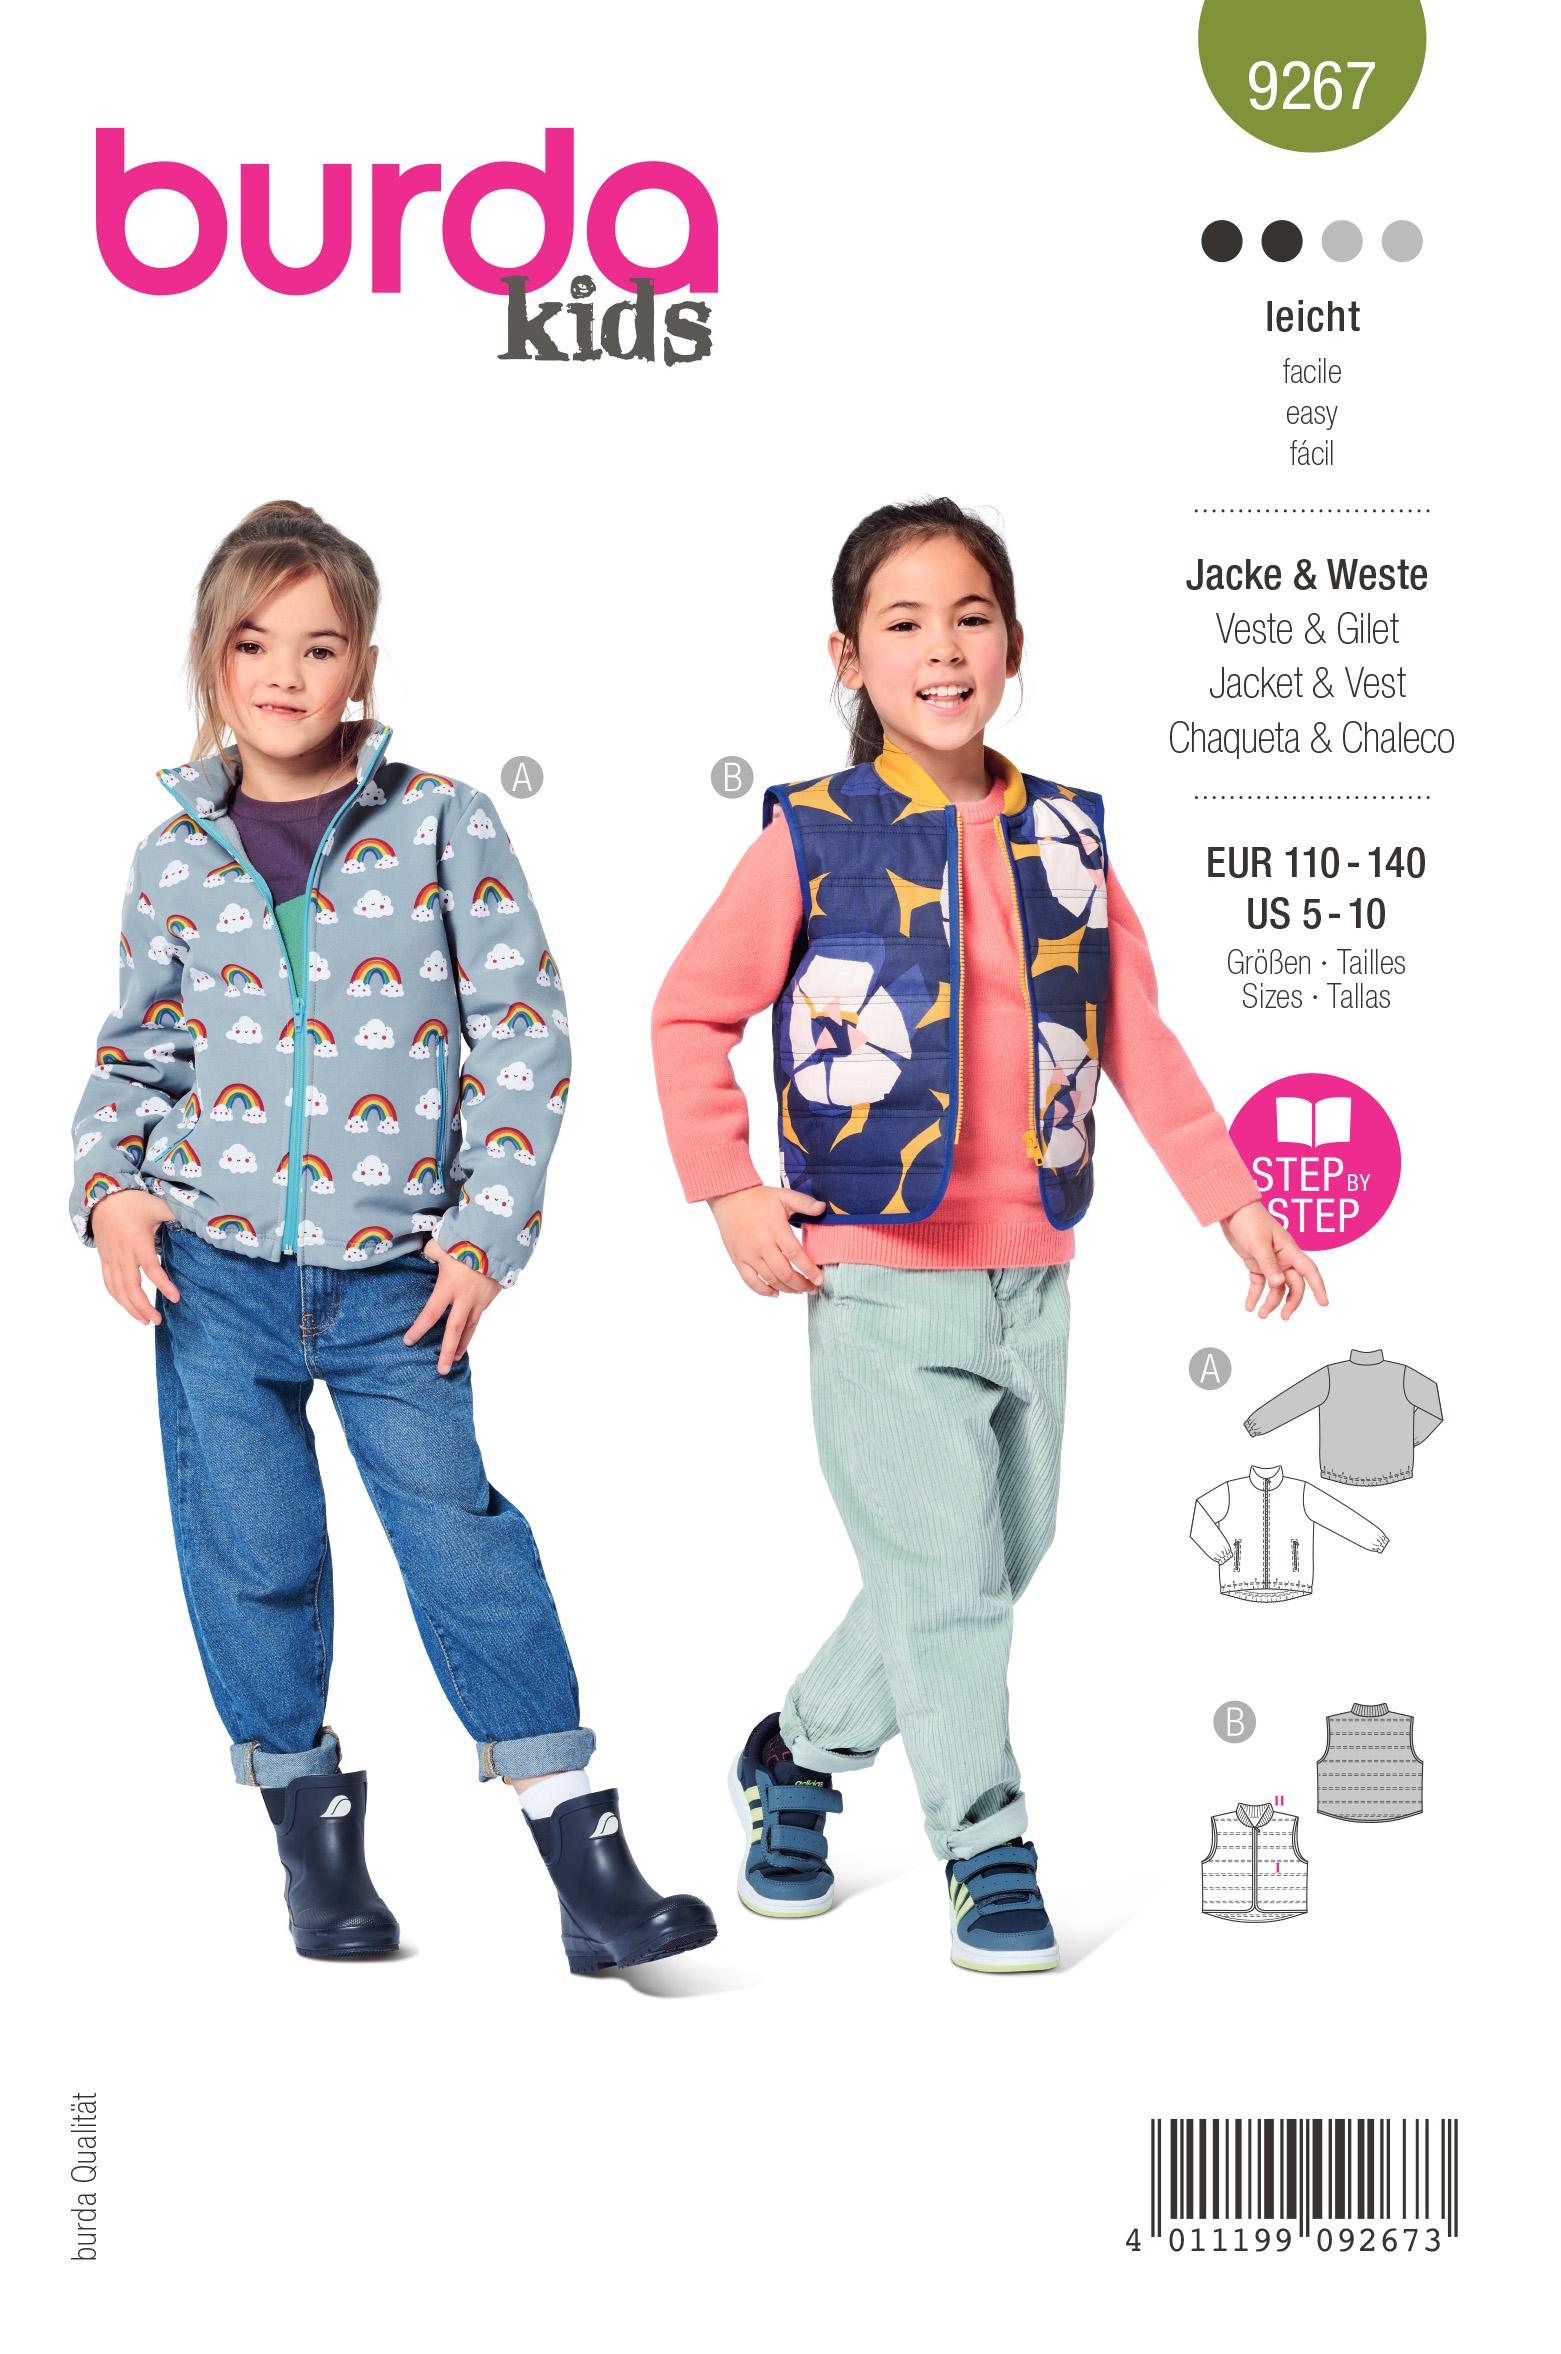 Burda 9267 Schnittmuster Jacke & Weste (kids, Gr. 110-140) Level 2 leicht